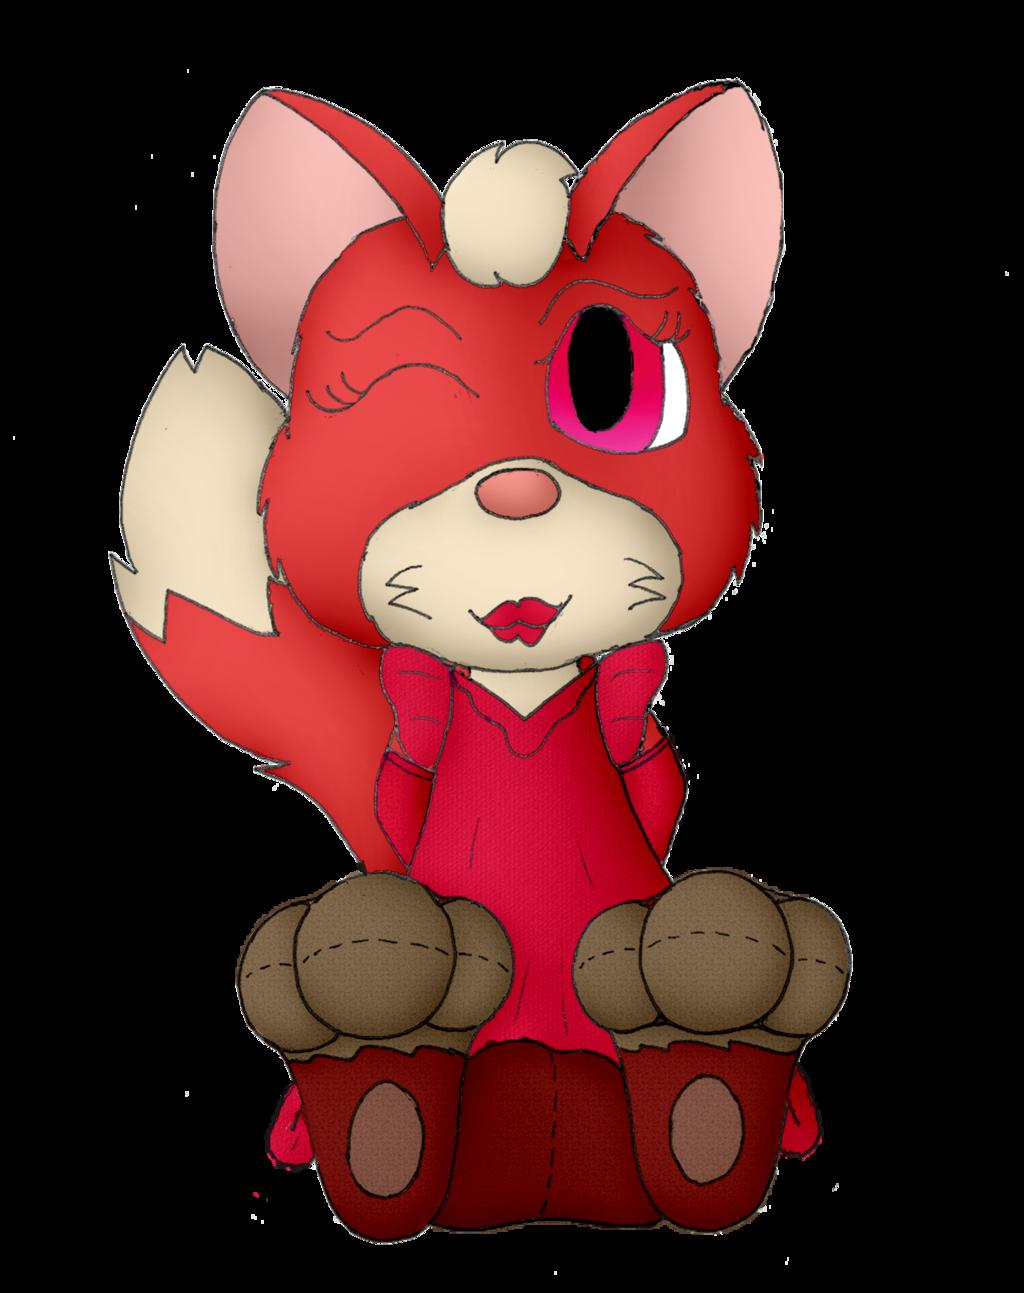 Foxy Tulip Shows Off Her Fancy Garments